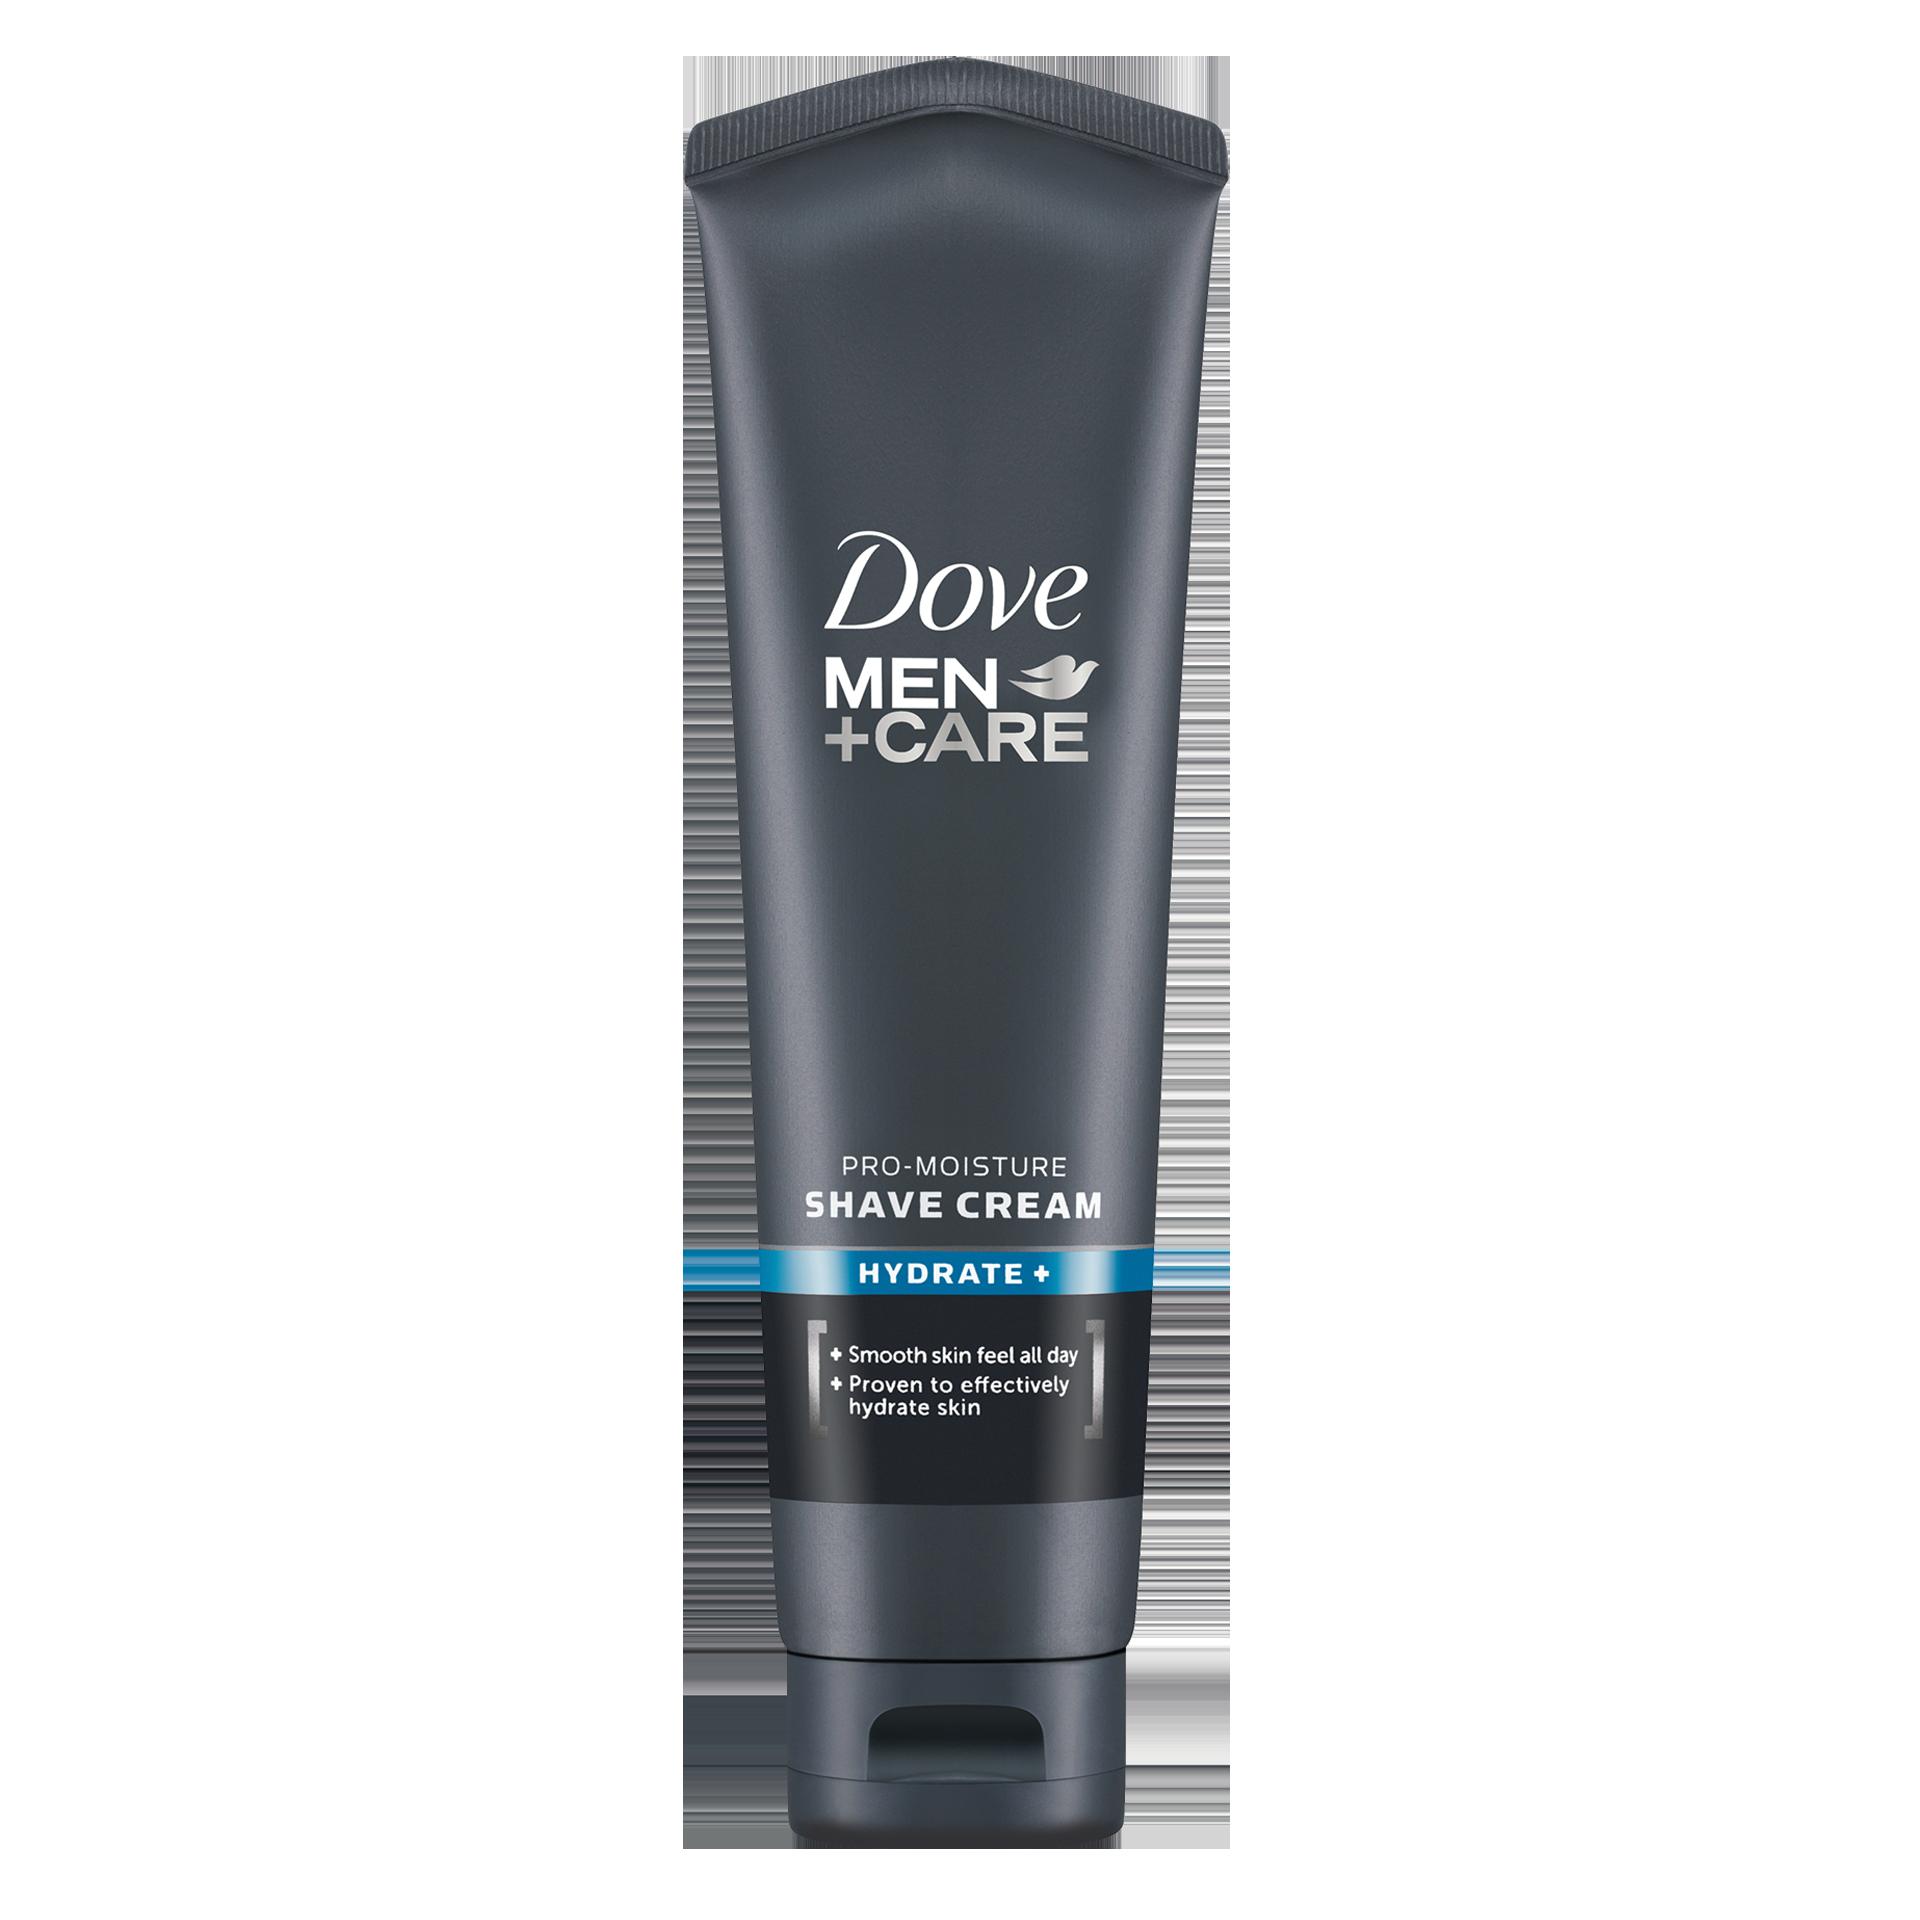 Best Skin Care Products Uk Our Skin Care Products Work For All Skin Types Like Dry Skin Oily Skin Normal Skin Sen Mens Shaving Cream Shaving Cream Men Care